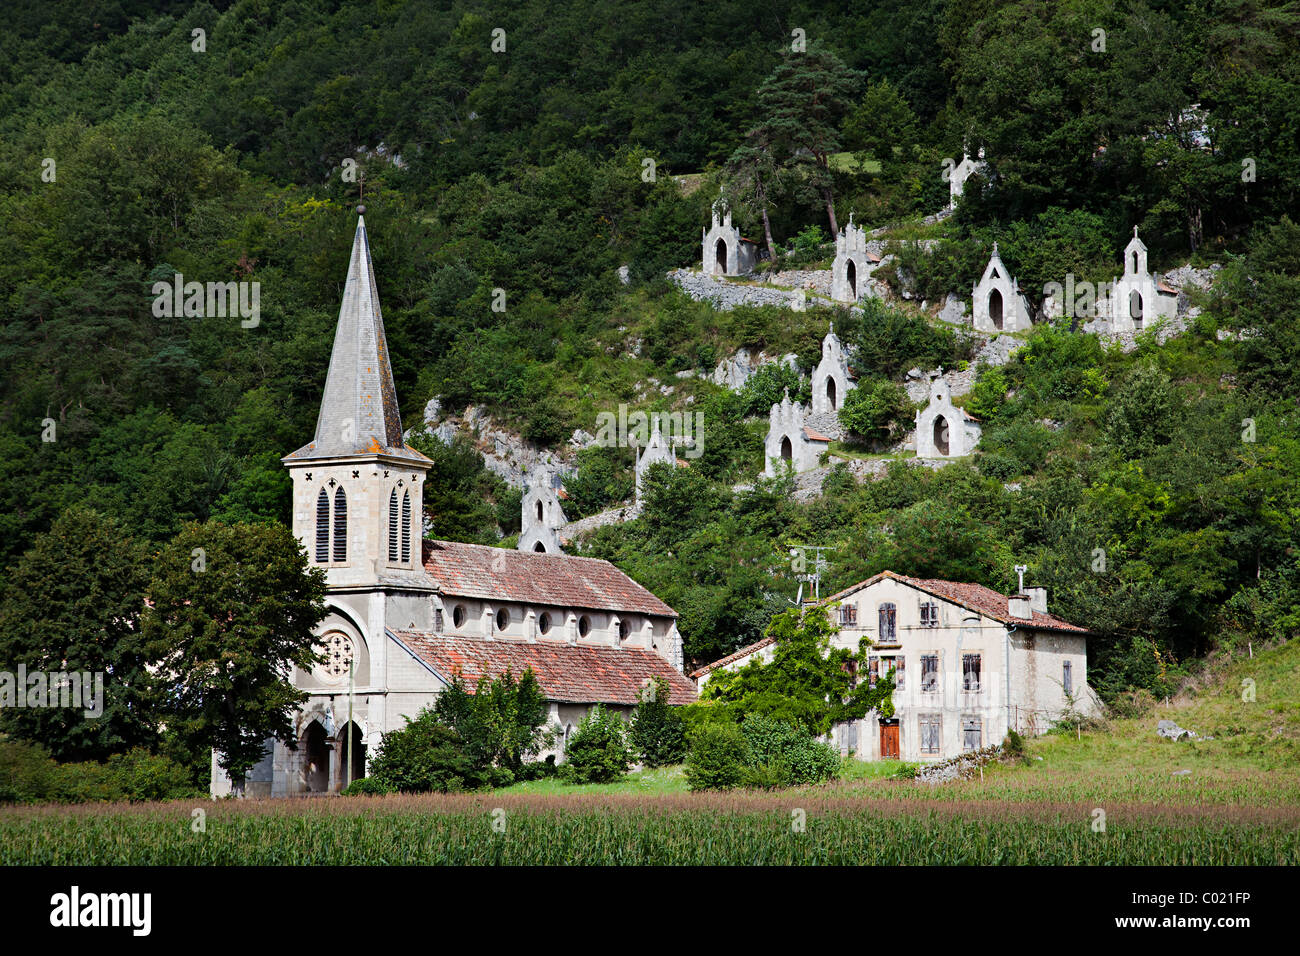 Eglise de Raynaude and Chemin de Croix department Ariege France Stock Photo